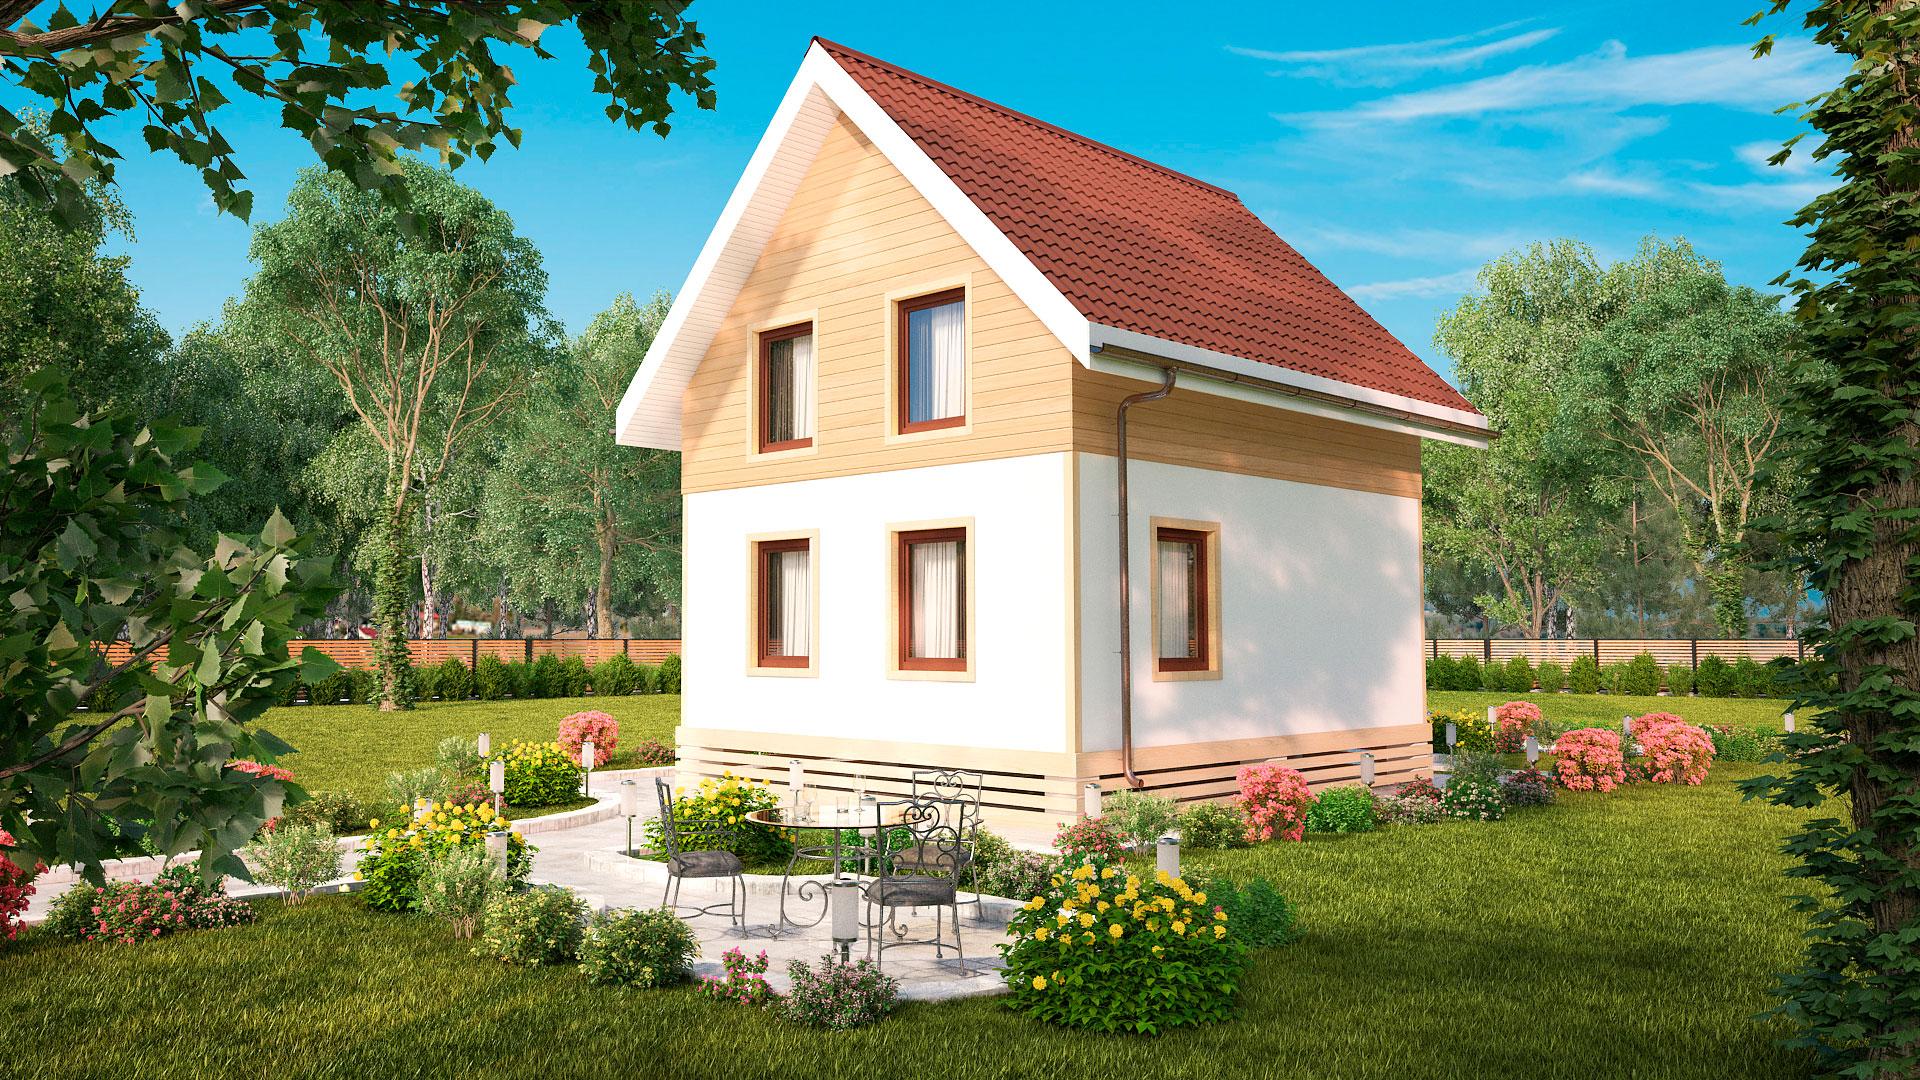 Задний фасад небольшого двухэтажного дома, проект БЭНПАН МС-92.